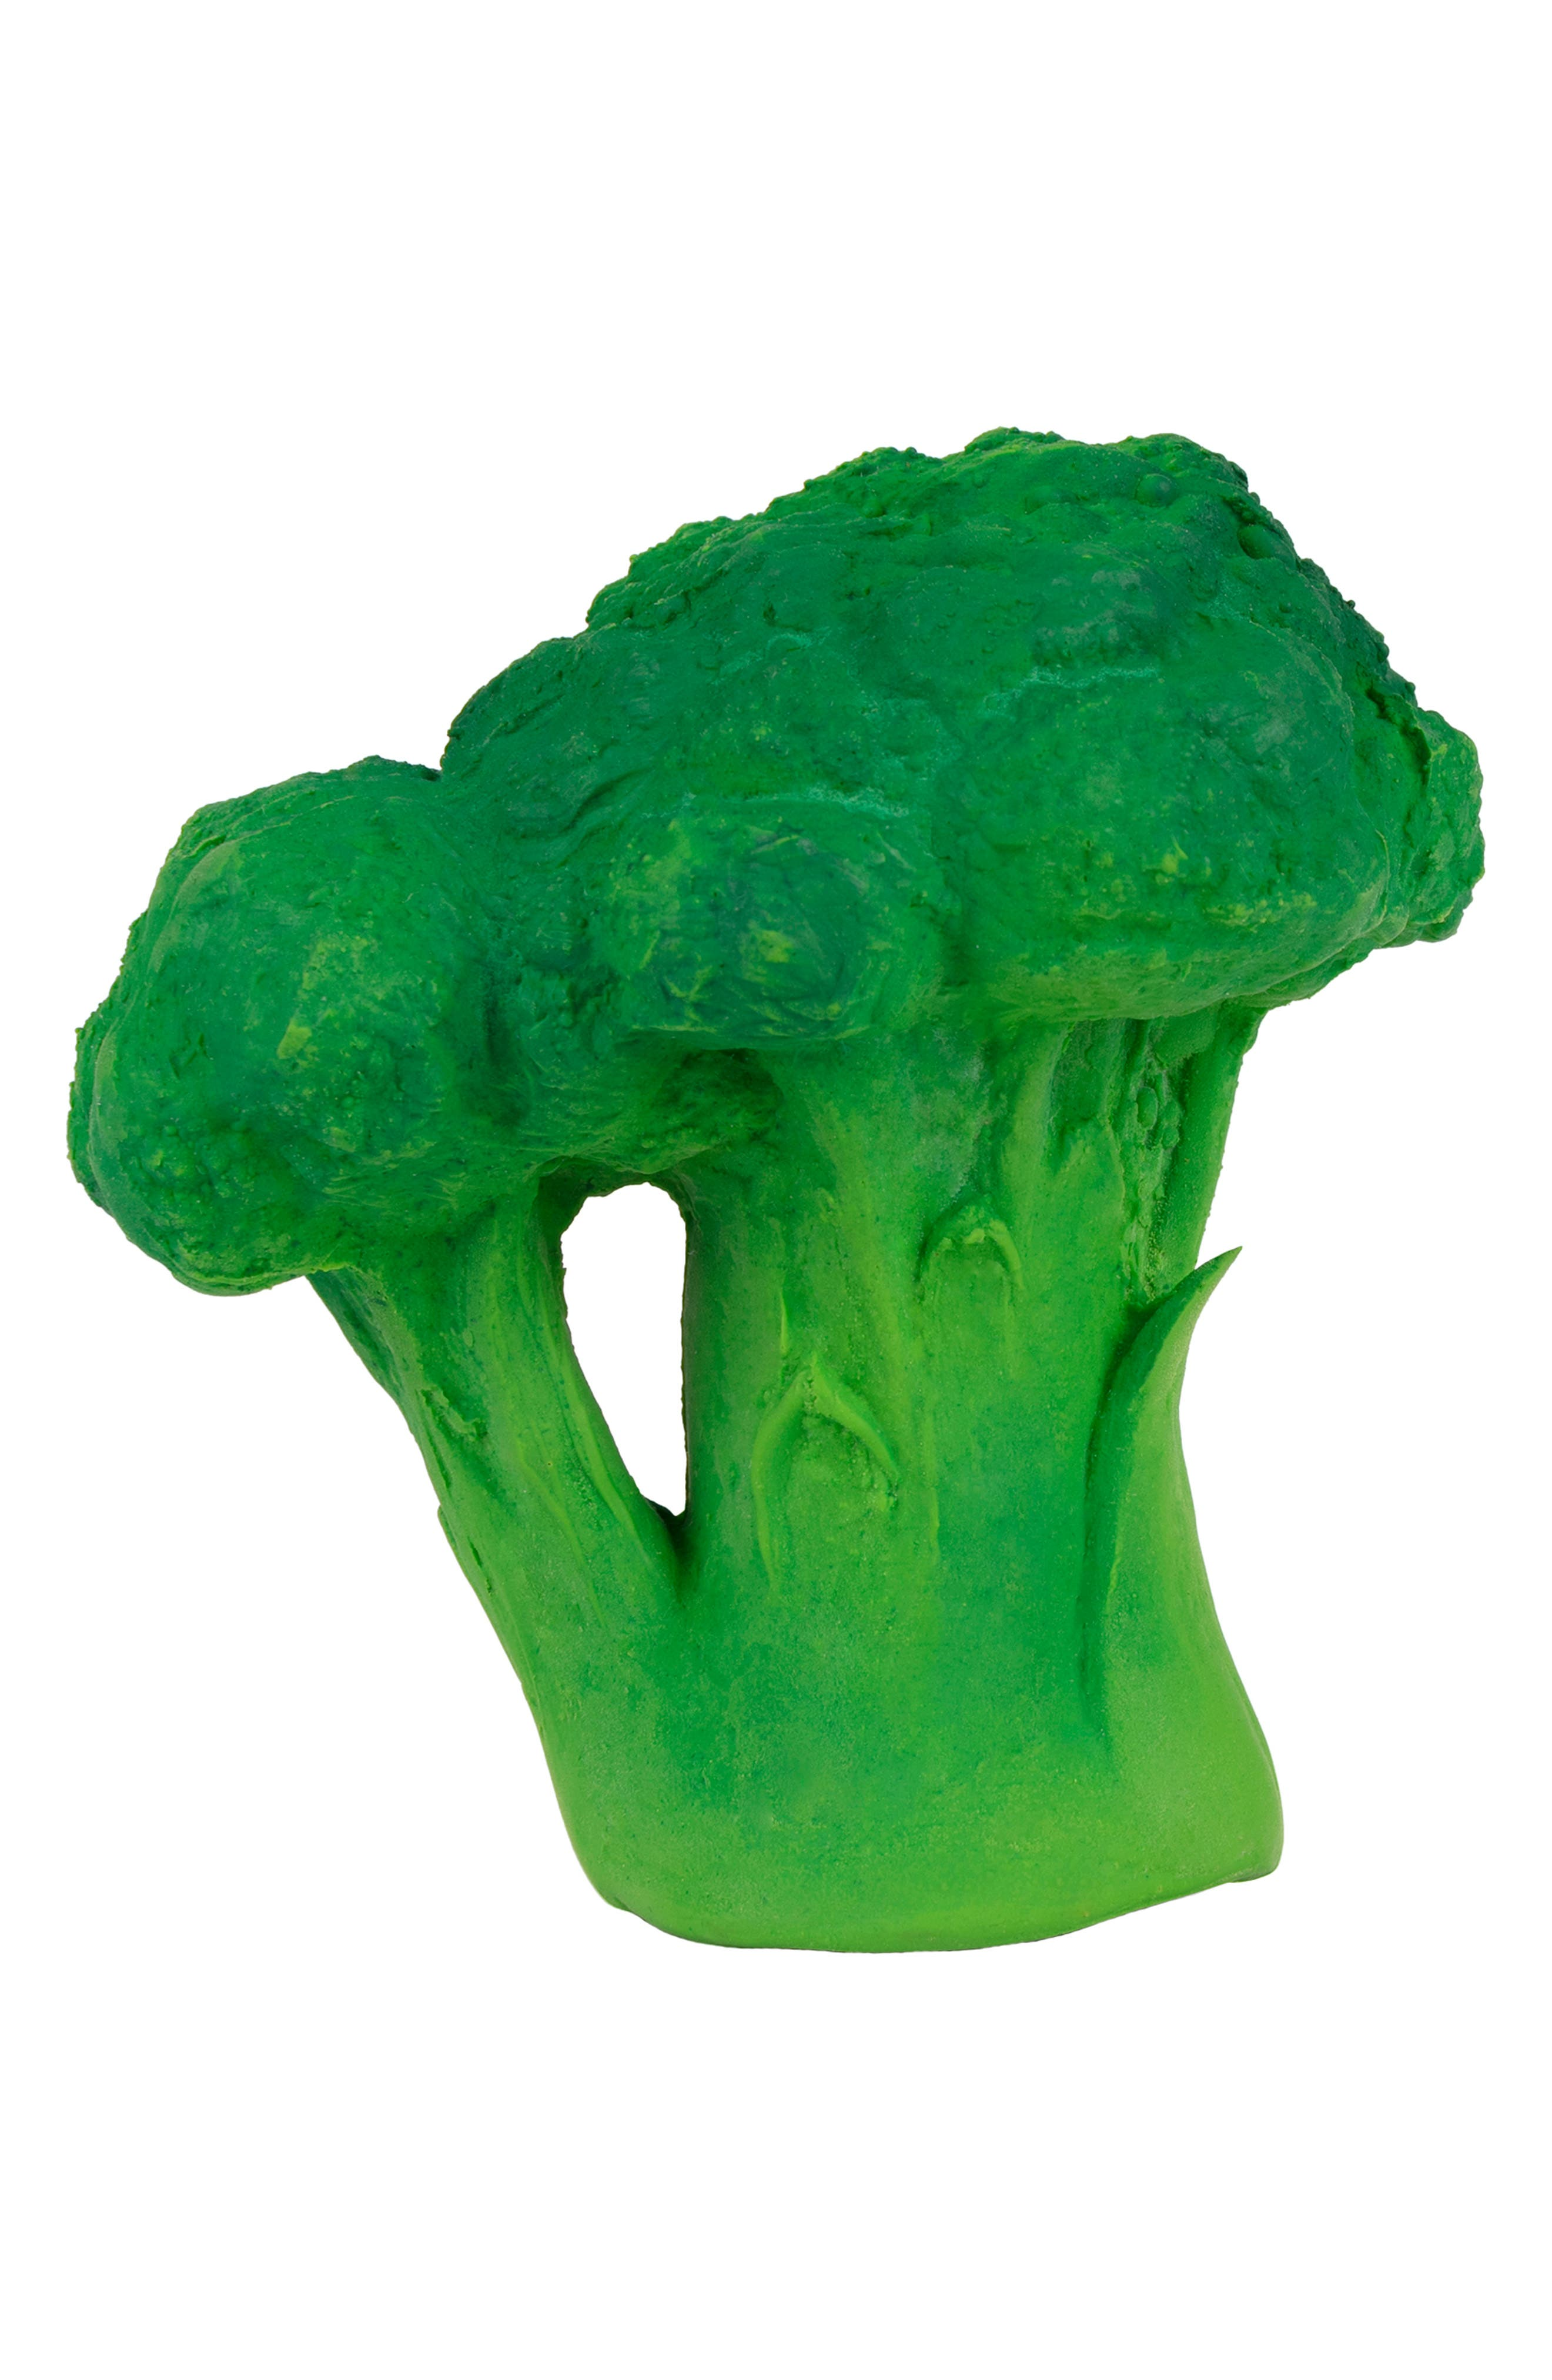 OLI & CAROL Oli and Carol Brucy the Broccoli Teething Toy, Main, color, GREEN